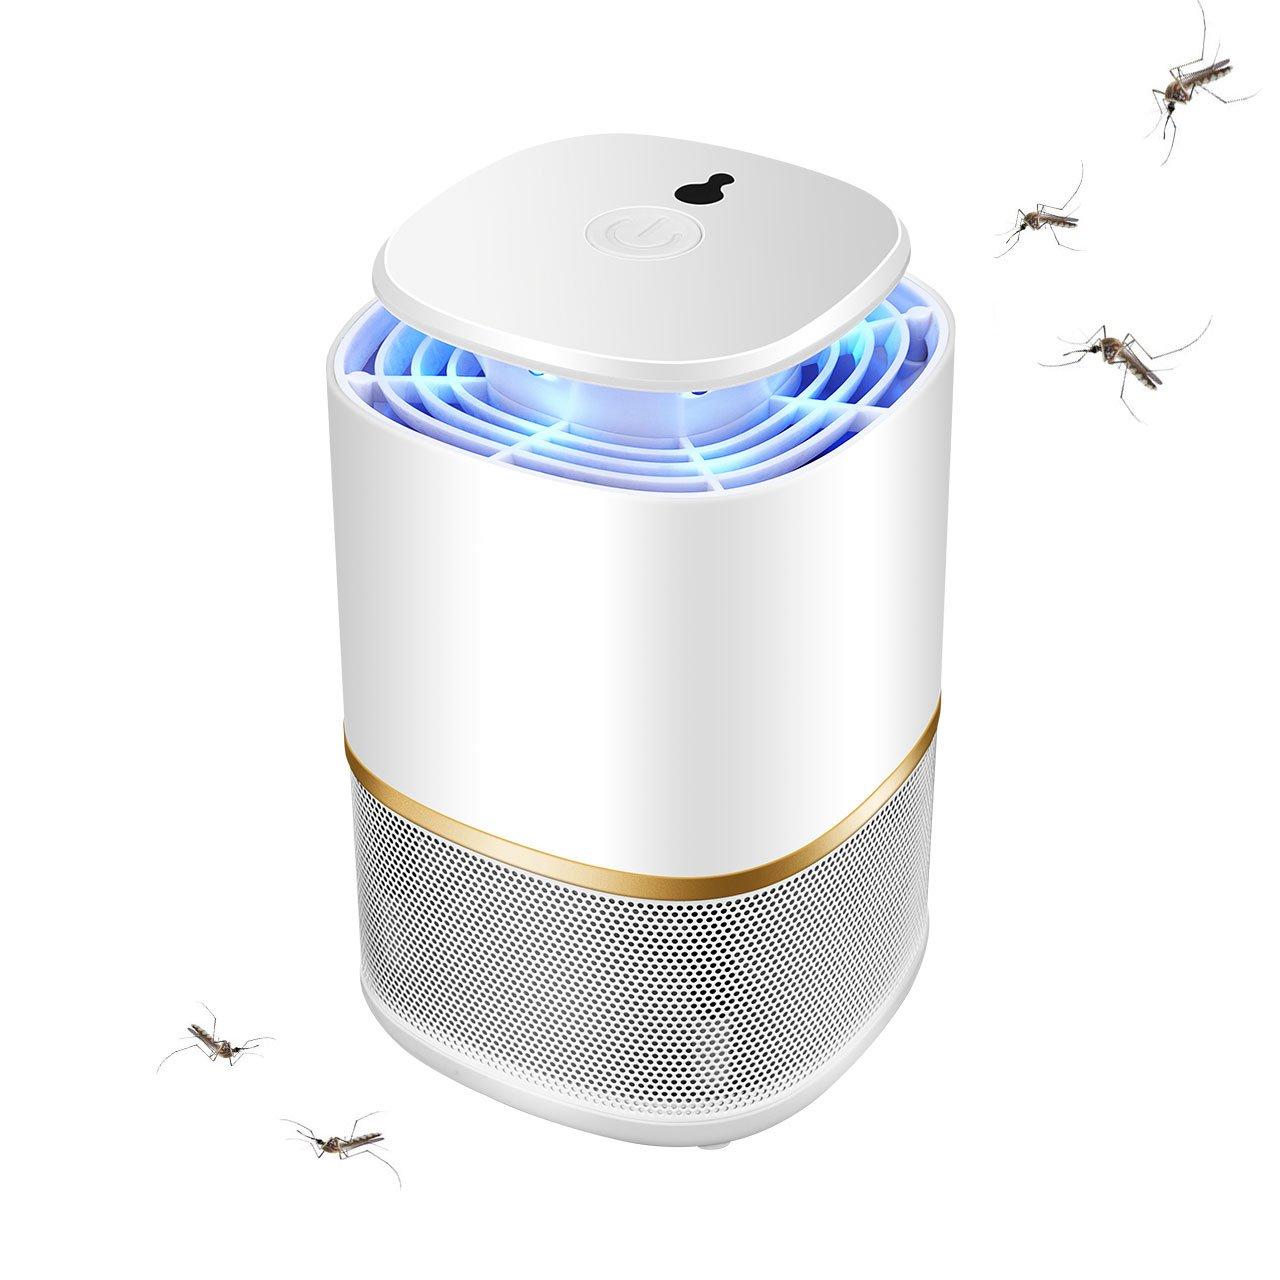 YXGN696-A Zapper Silencioso No Tóxico Mosquito USB Killer Lámpara Portable La Del Asesino De La Portable Mosca Anti Inhalador De La Mosca Del Insecto Lámpara Eléctrica Del Mosquito Que Mata LED 6af51b